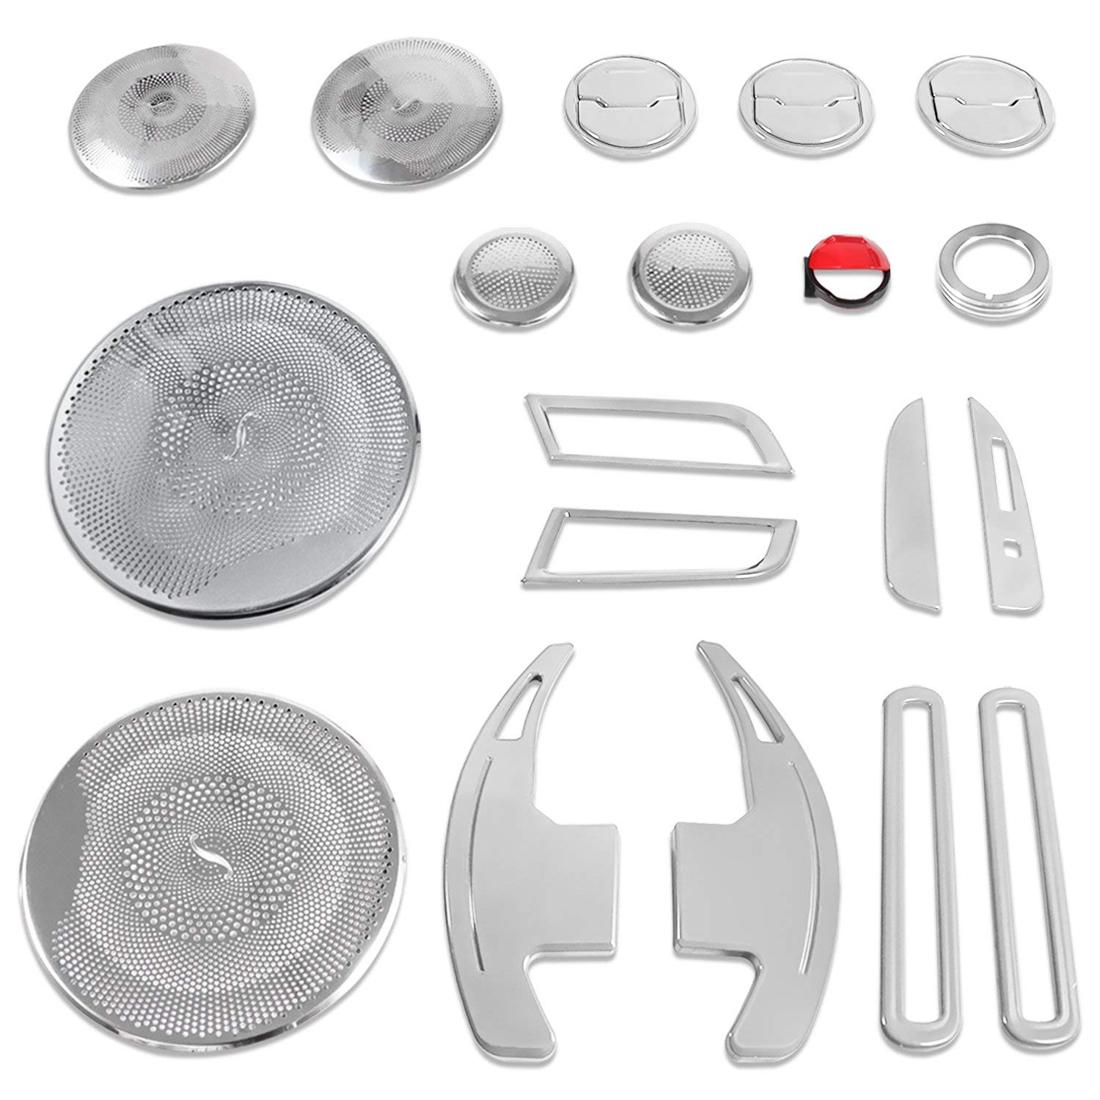 Car Interior Decoration Speaker Air Vent Kit Trim For 2015-2018 Ford Mustang #ya